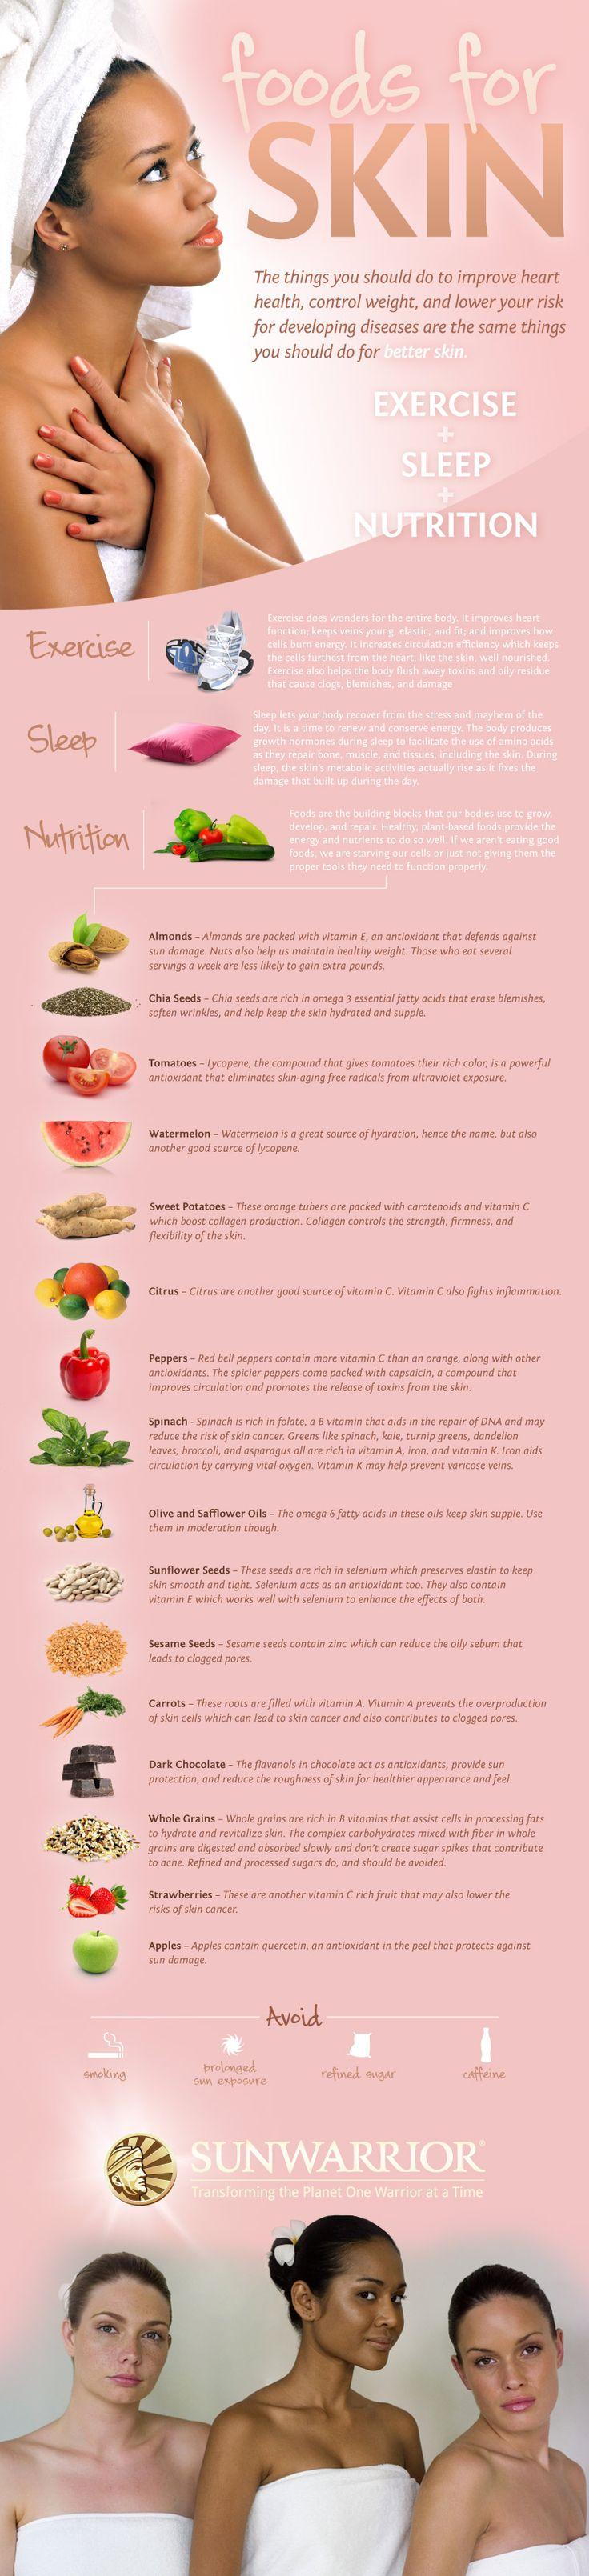 Foods for healthier radiant skin